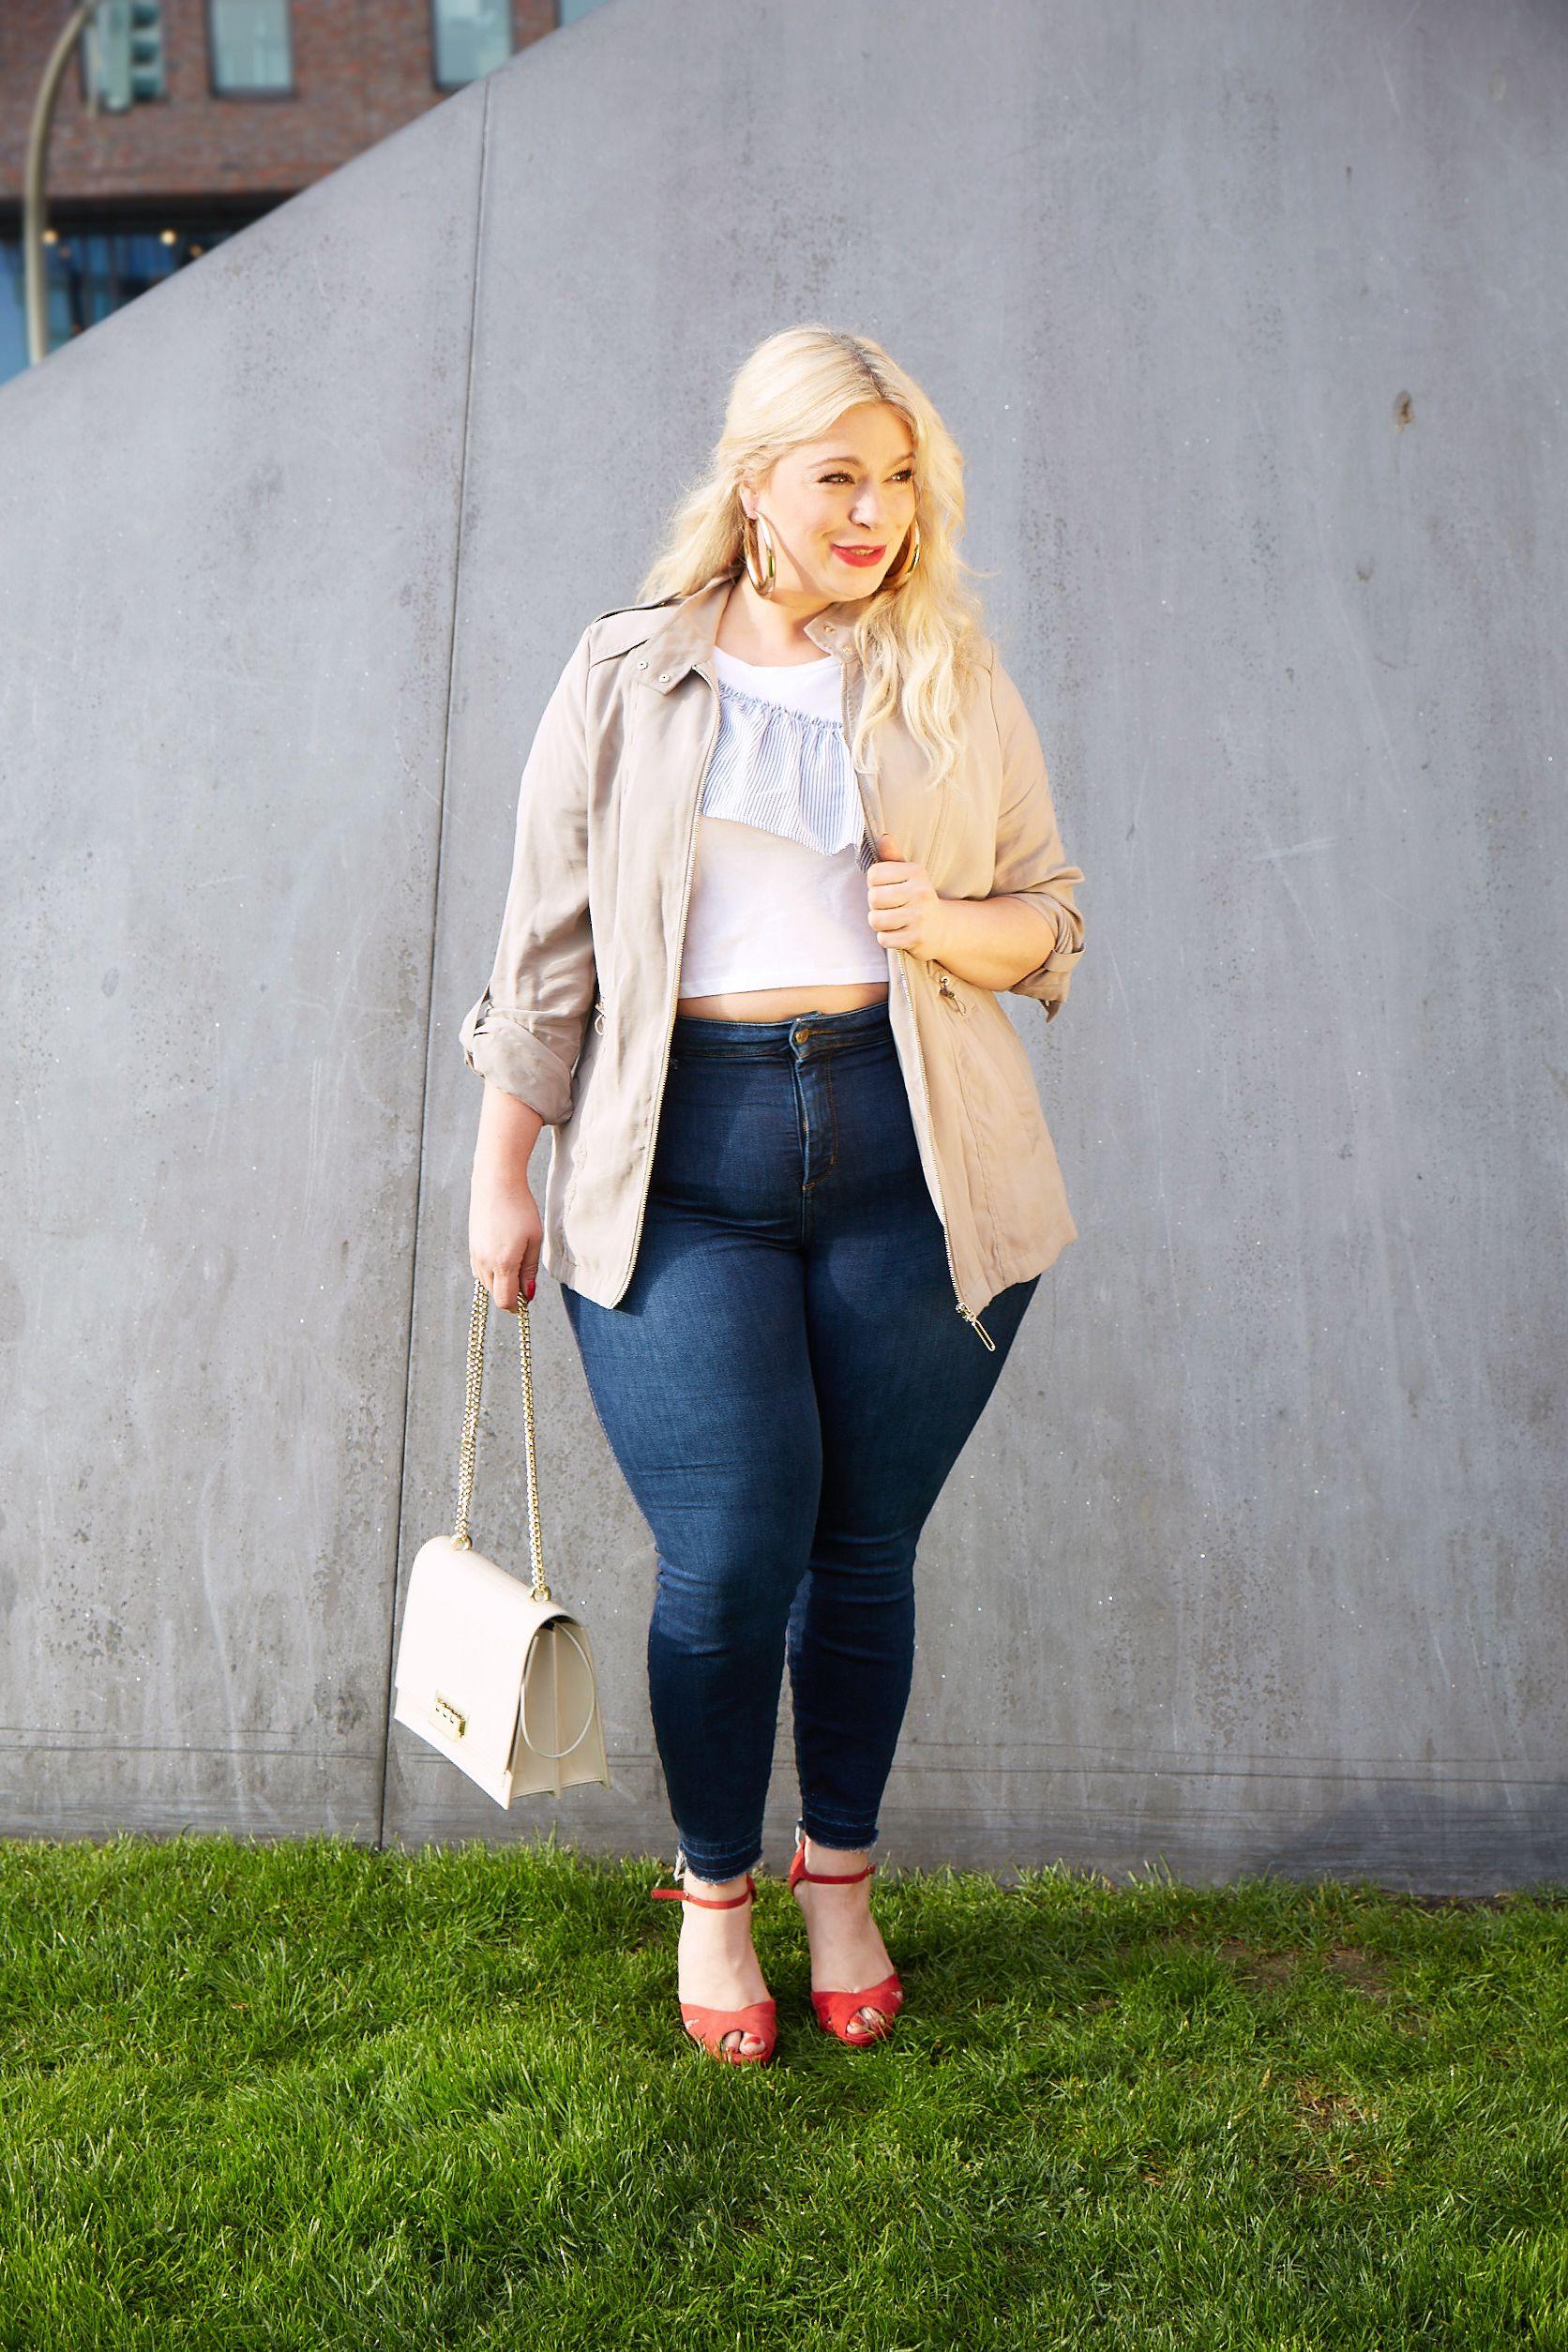 Plus Size Fashion For Women Plussize Mode Grosse Grossen Modestil Plus Size Kleidung